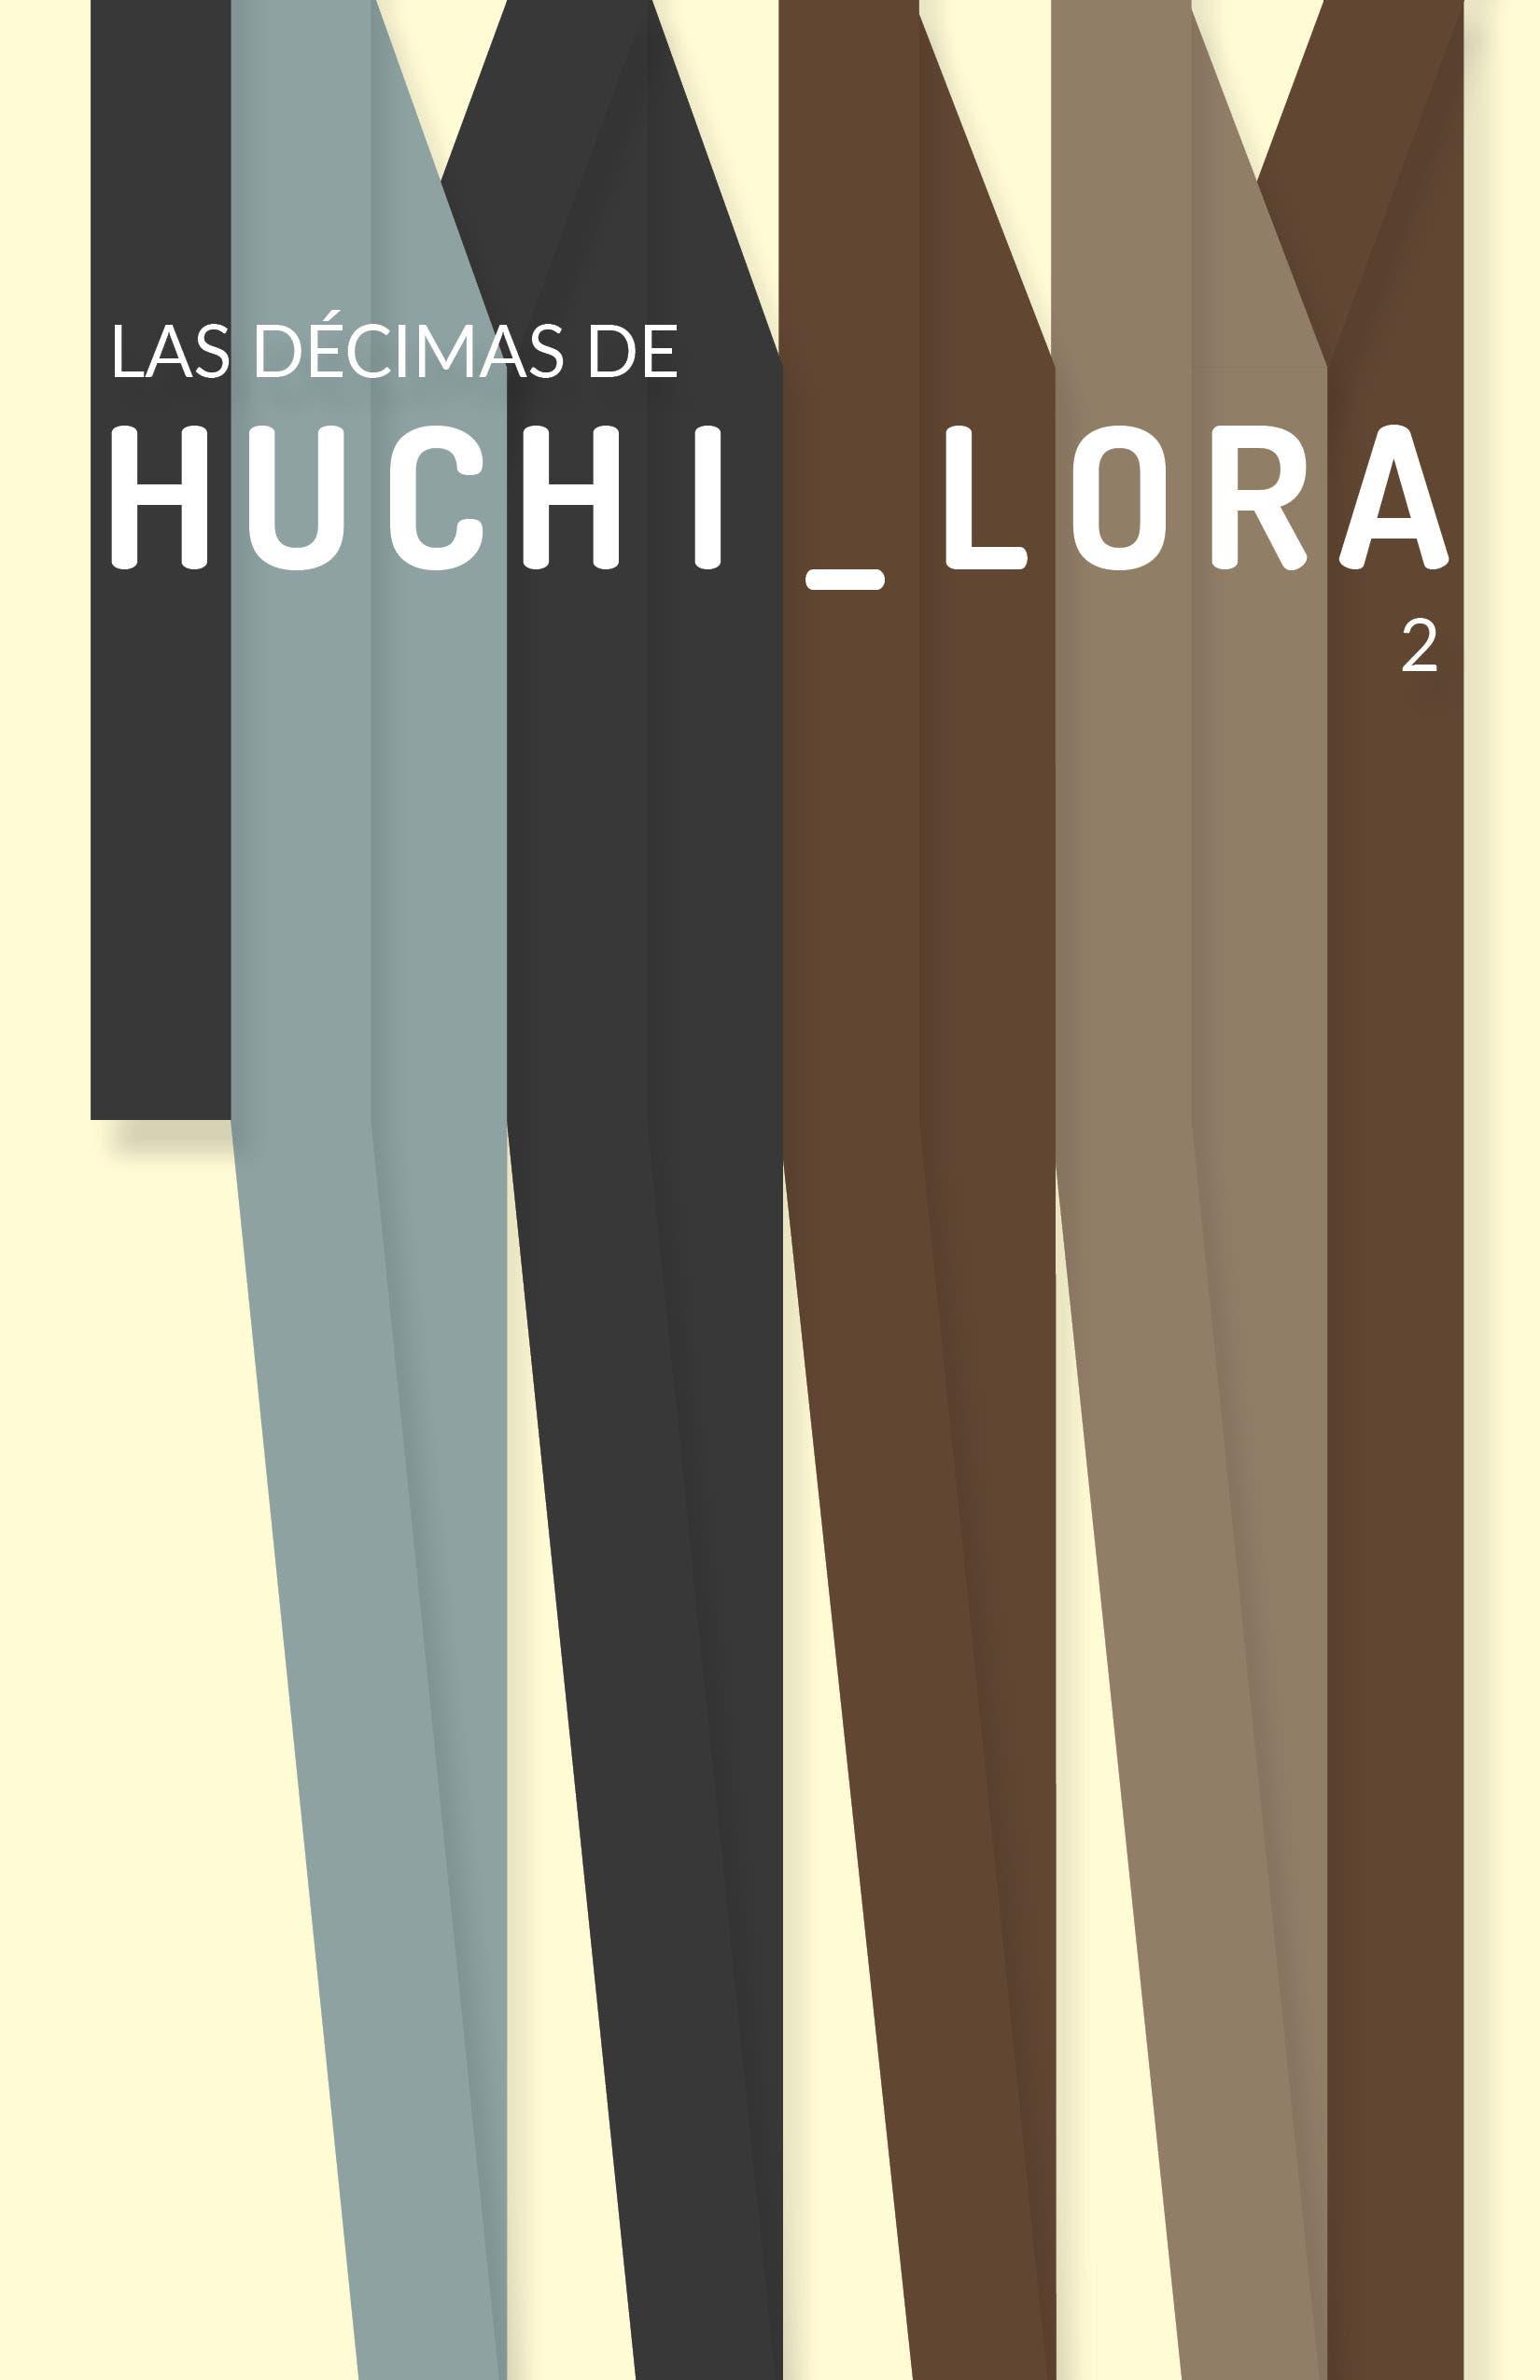 huchi-portada-abril13